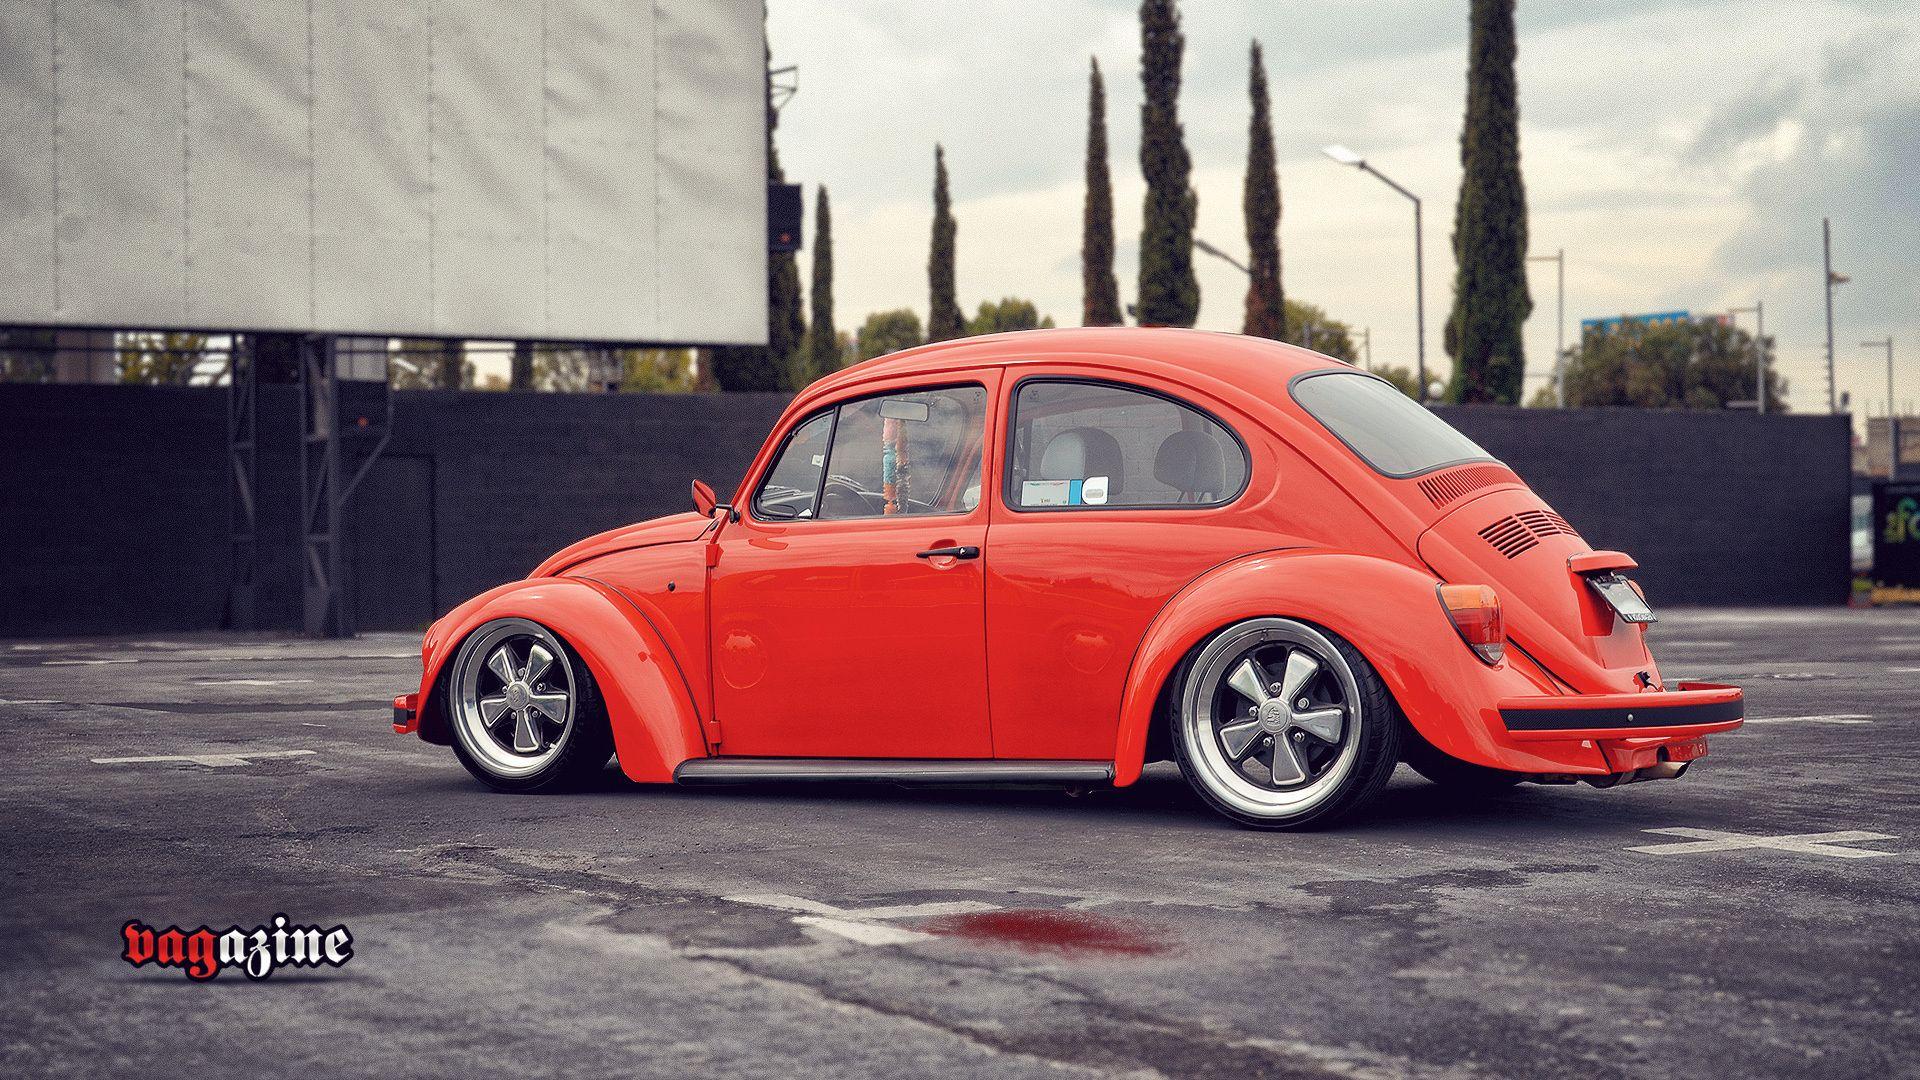 vw bug - lowered vw bug & porsche wheels | vw | pinterest